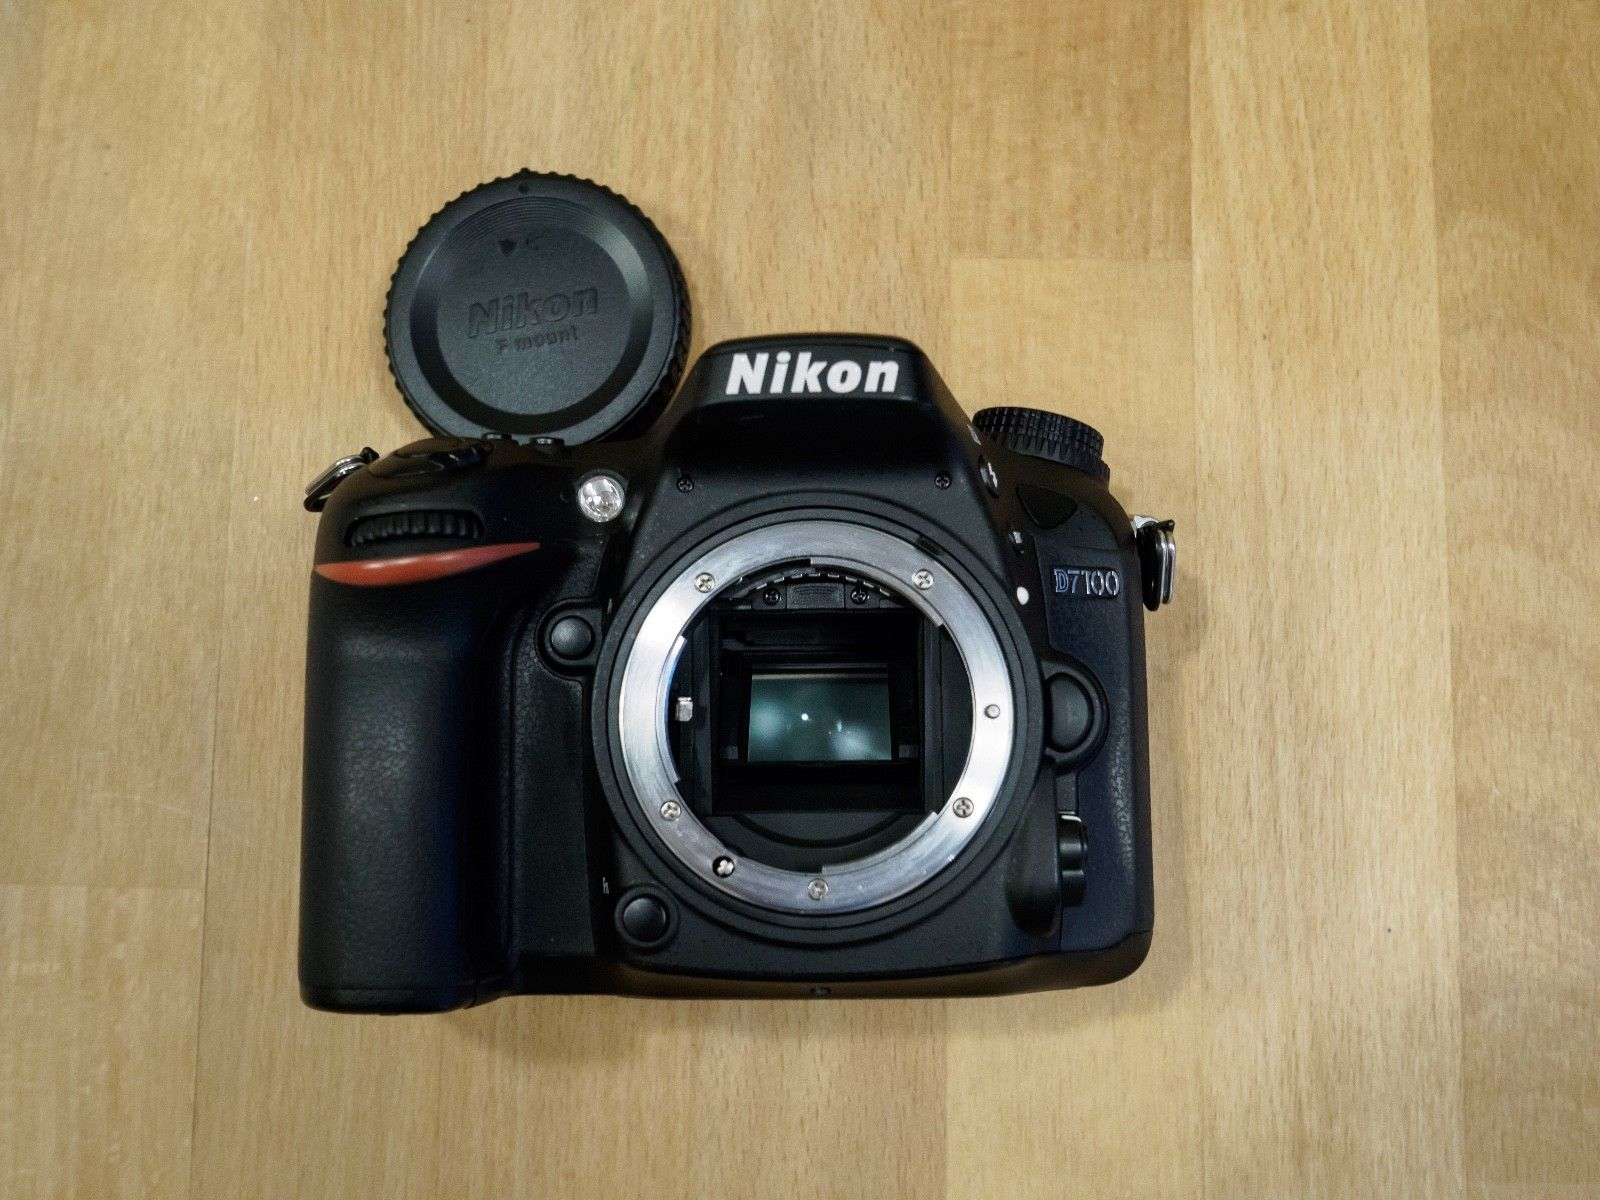 Nikon D7100 24.1 MP SLR-Digitalkamera, nur 9500 Auslösungen, inkl. Zubehörpaket